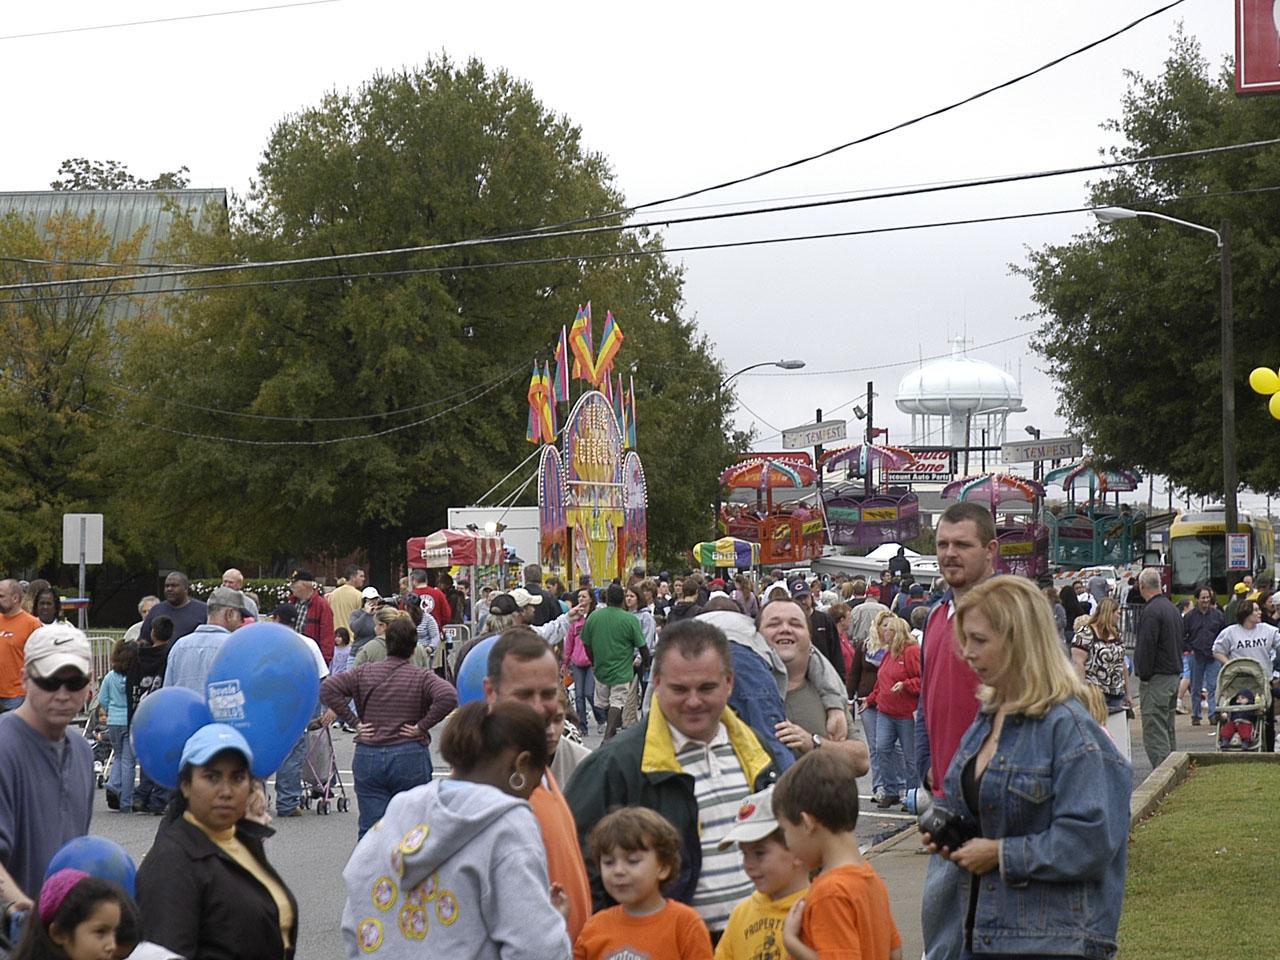 2008 Lexington Barbecue Festival